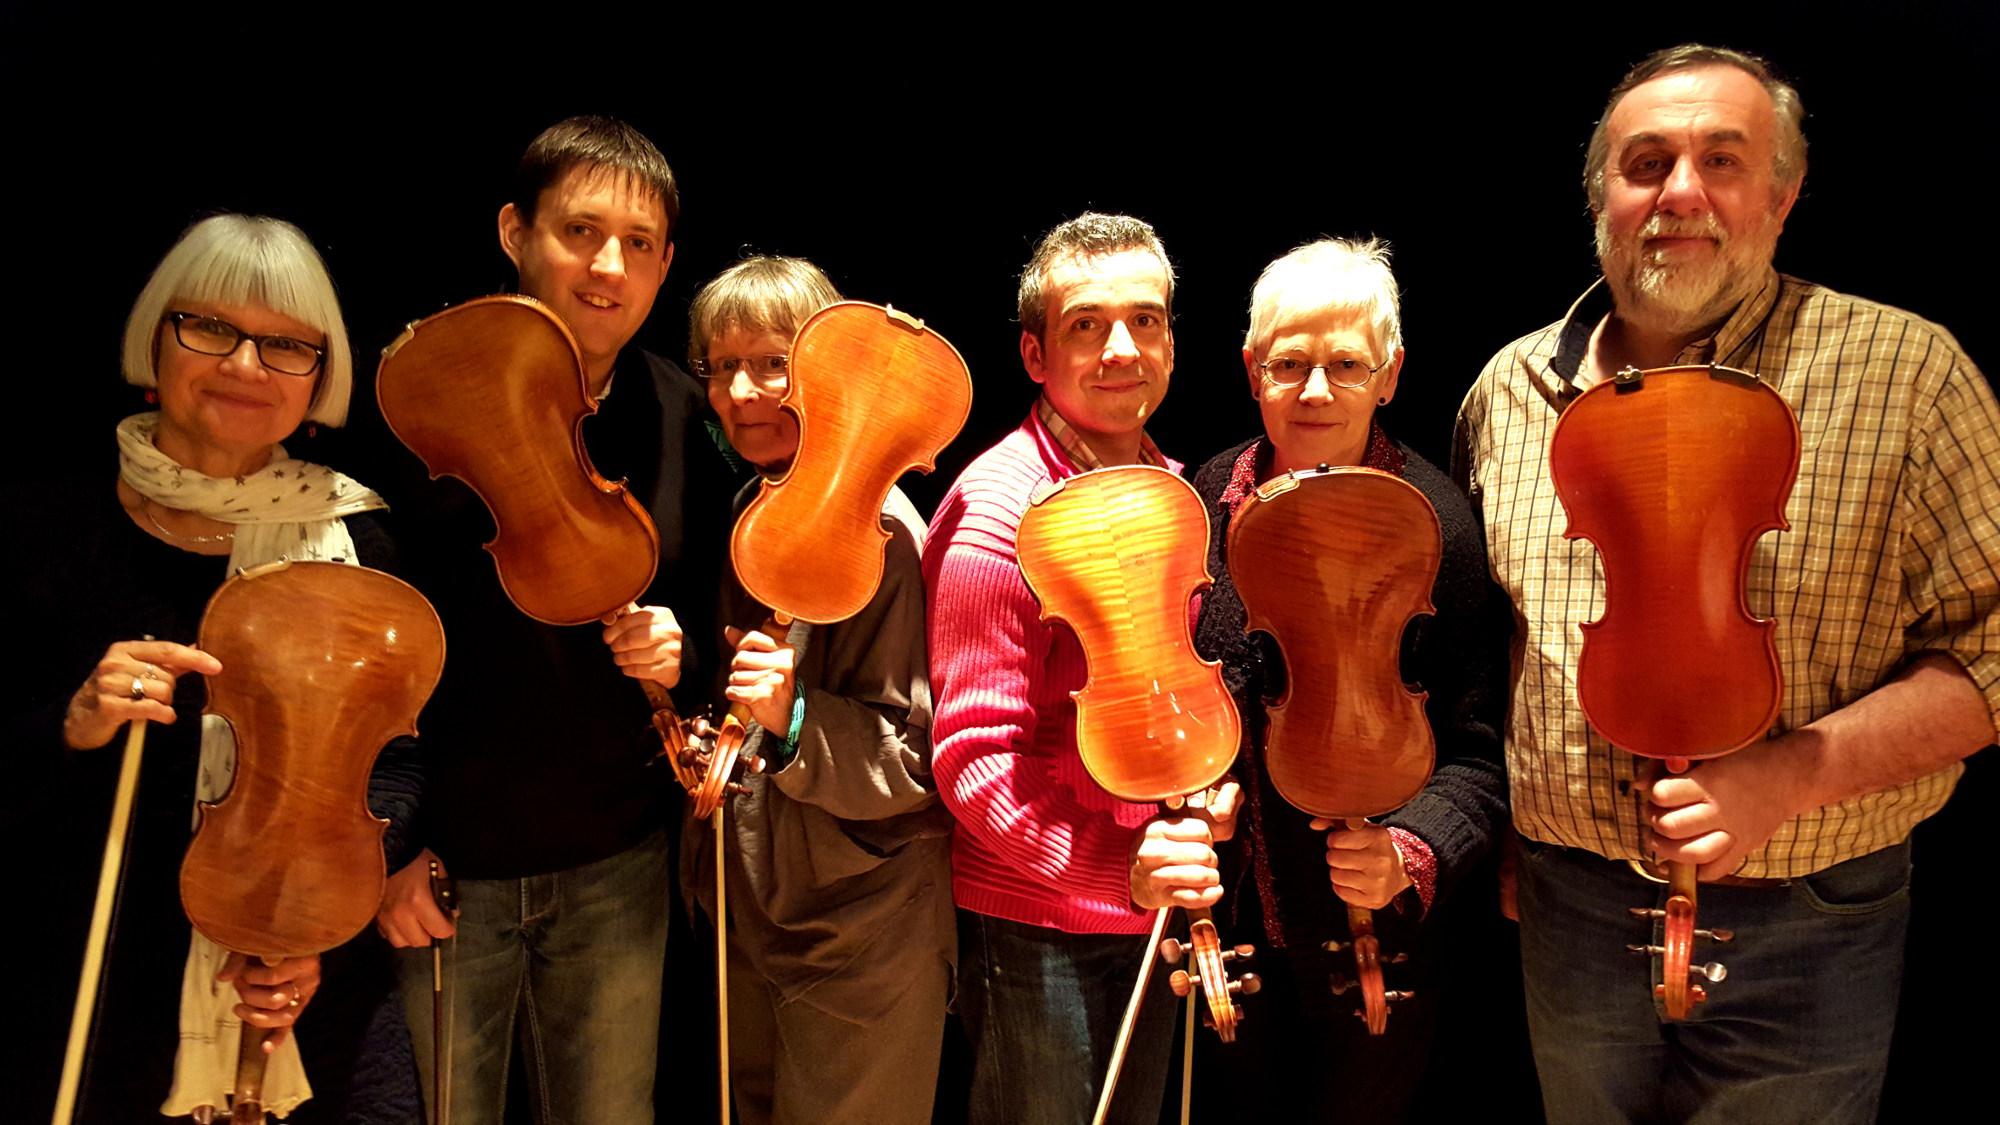 les-violons-de-nedde_1258